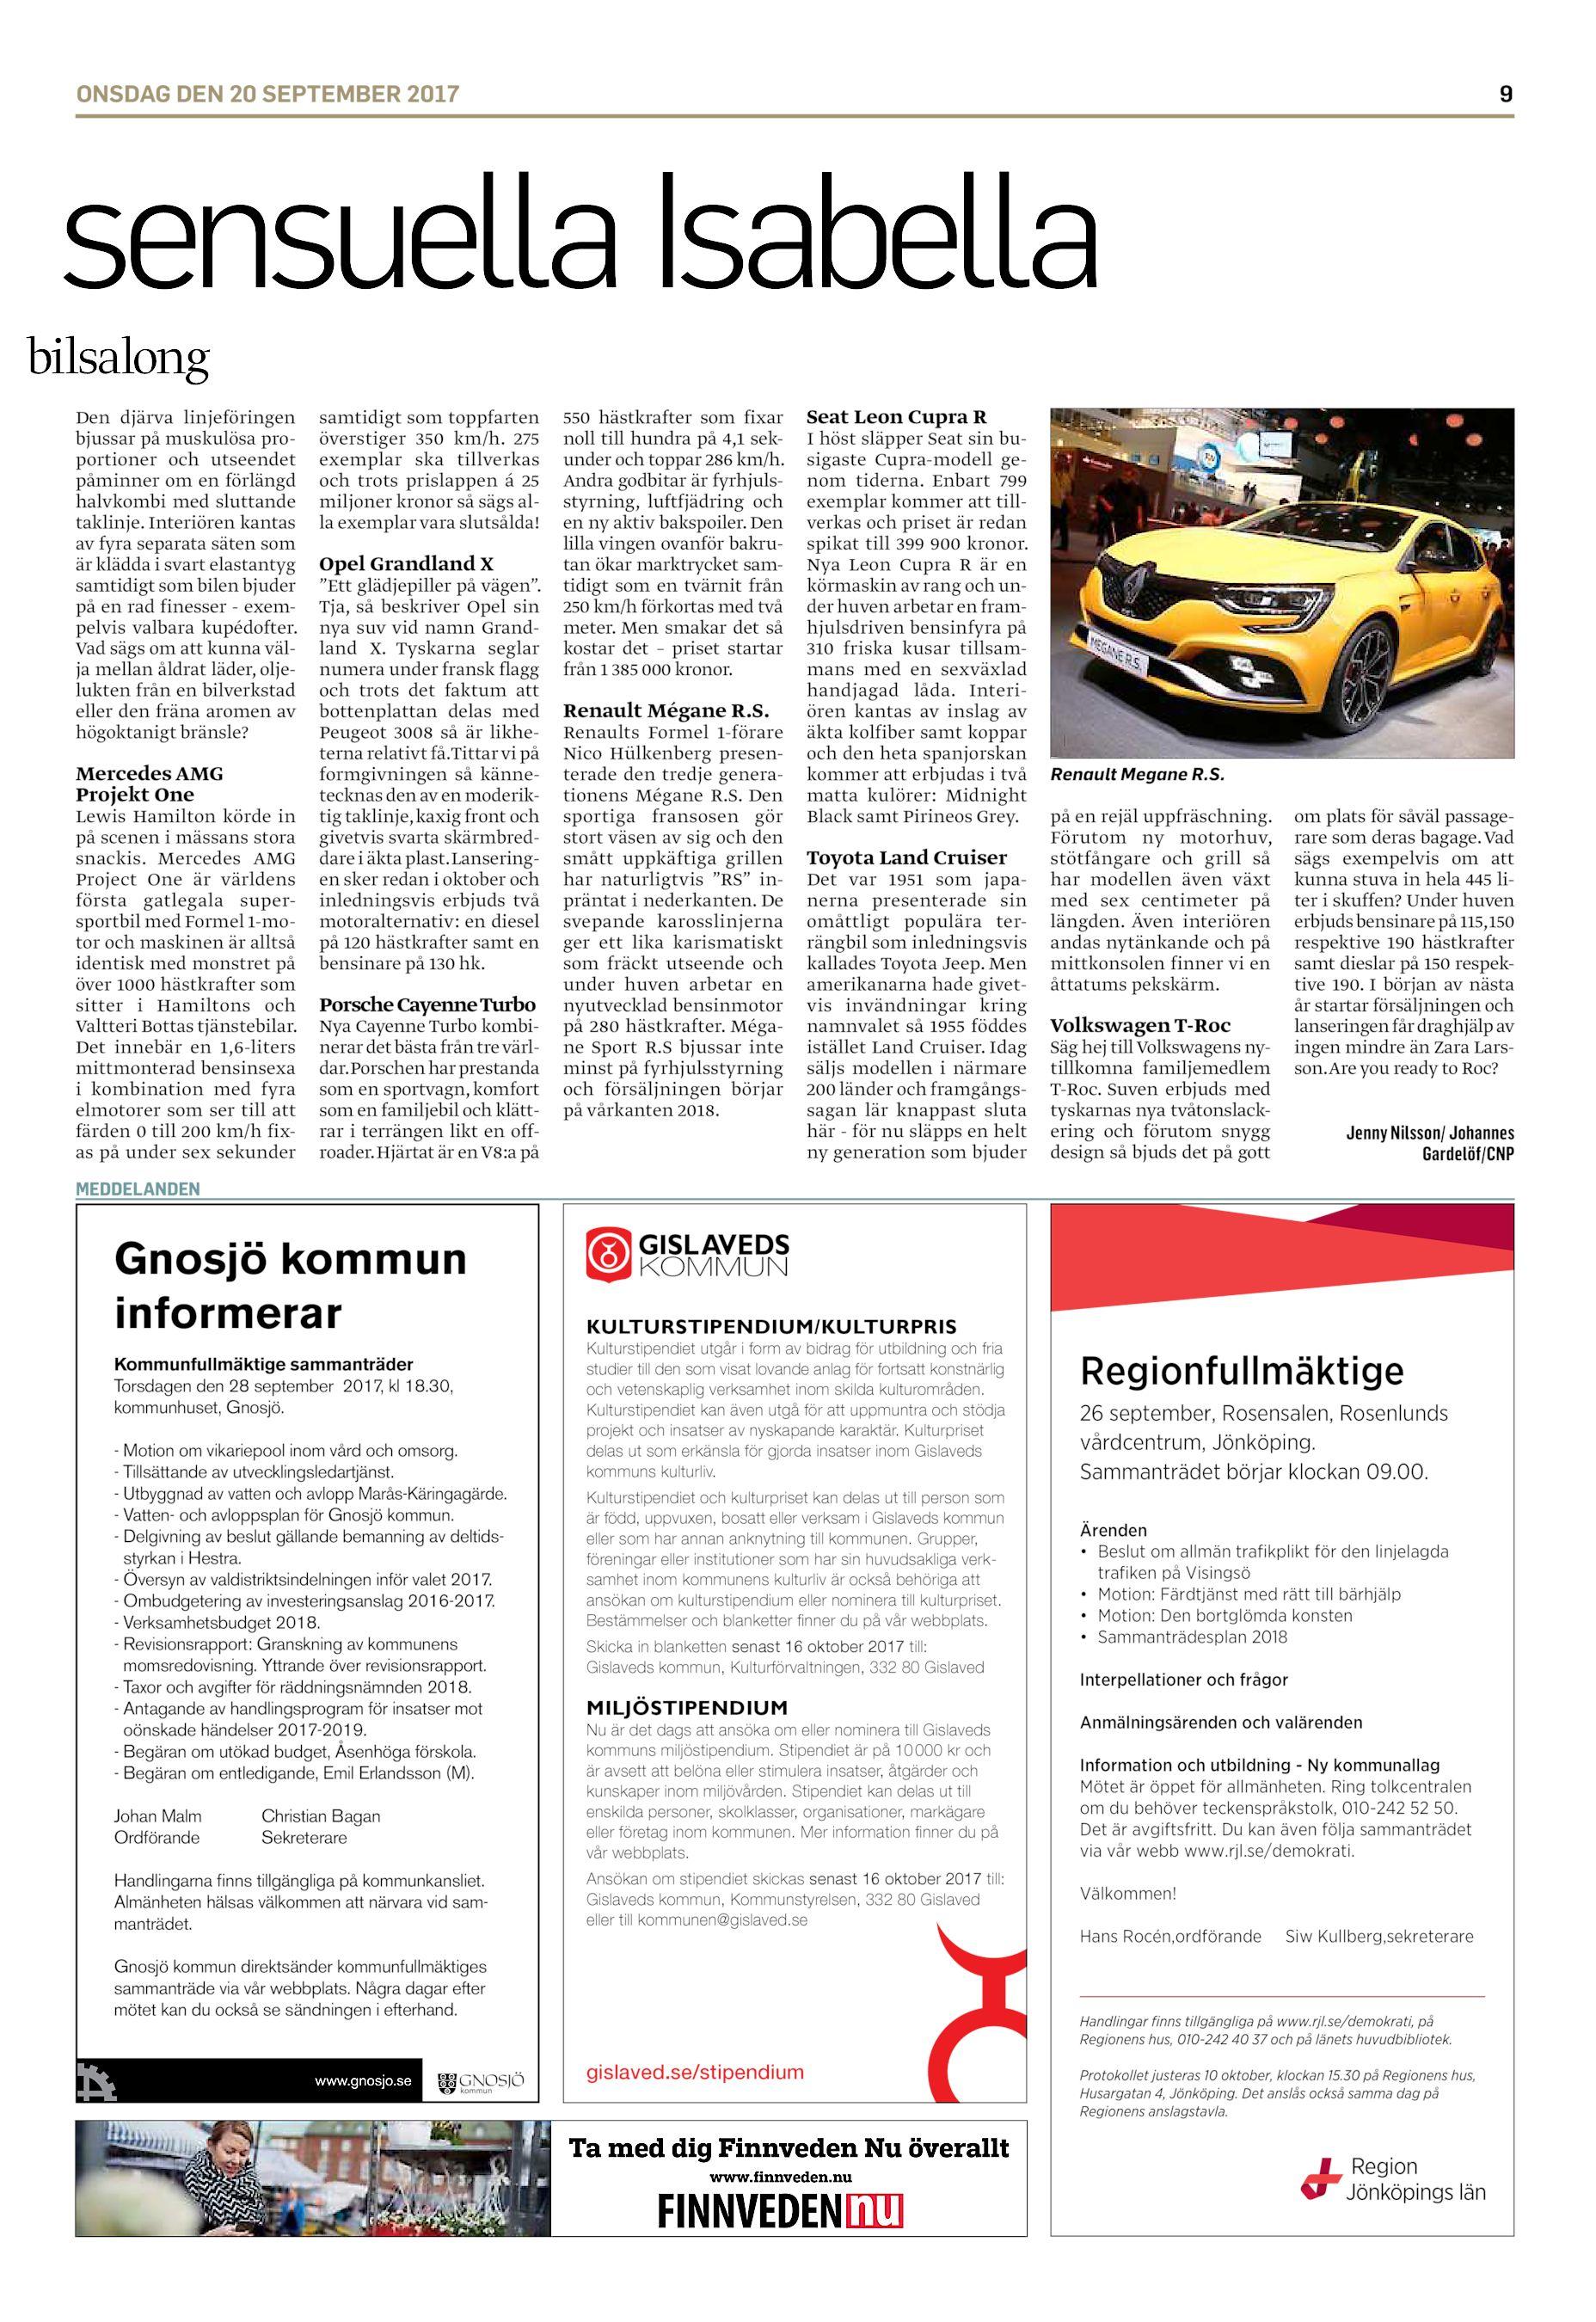 Taxi Cab kön videor största Dicks jävla